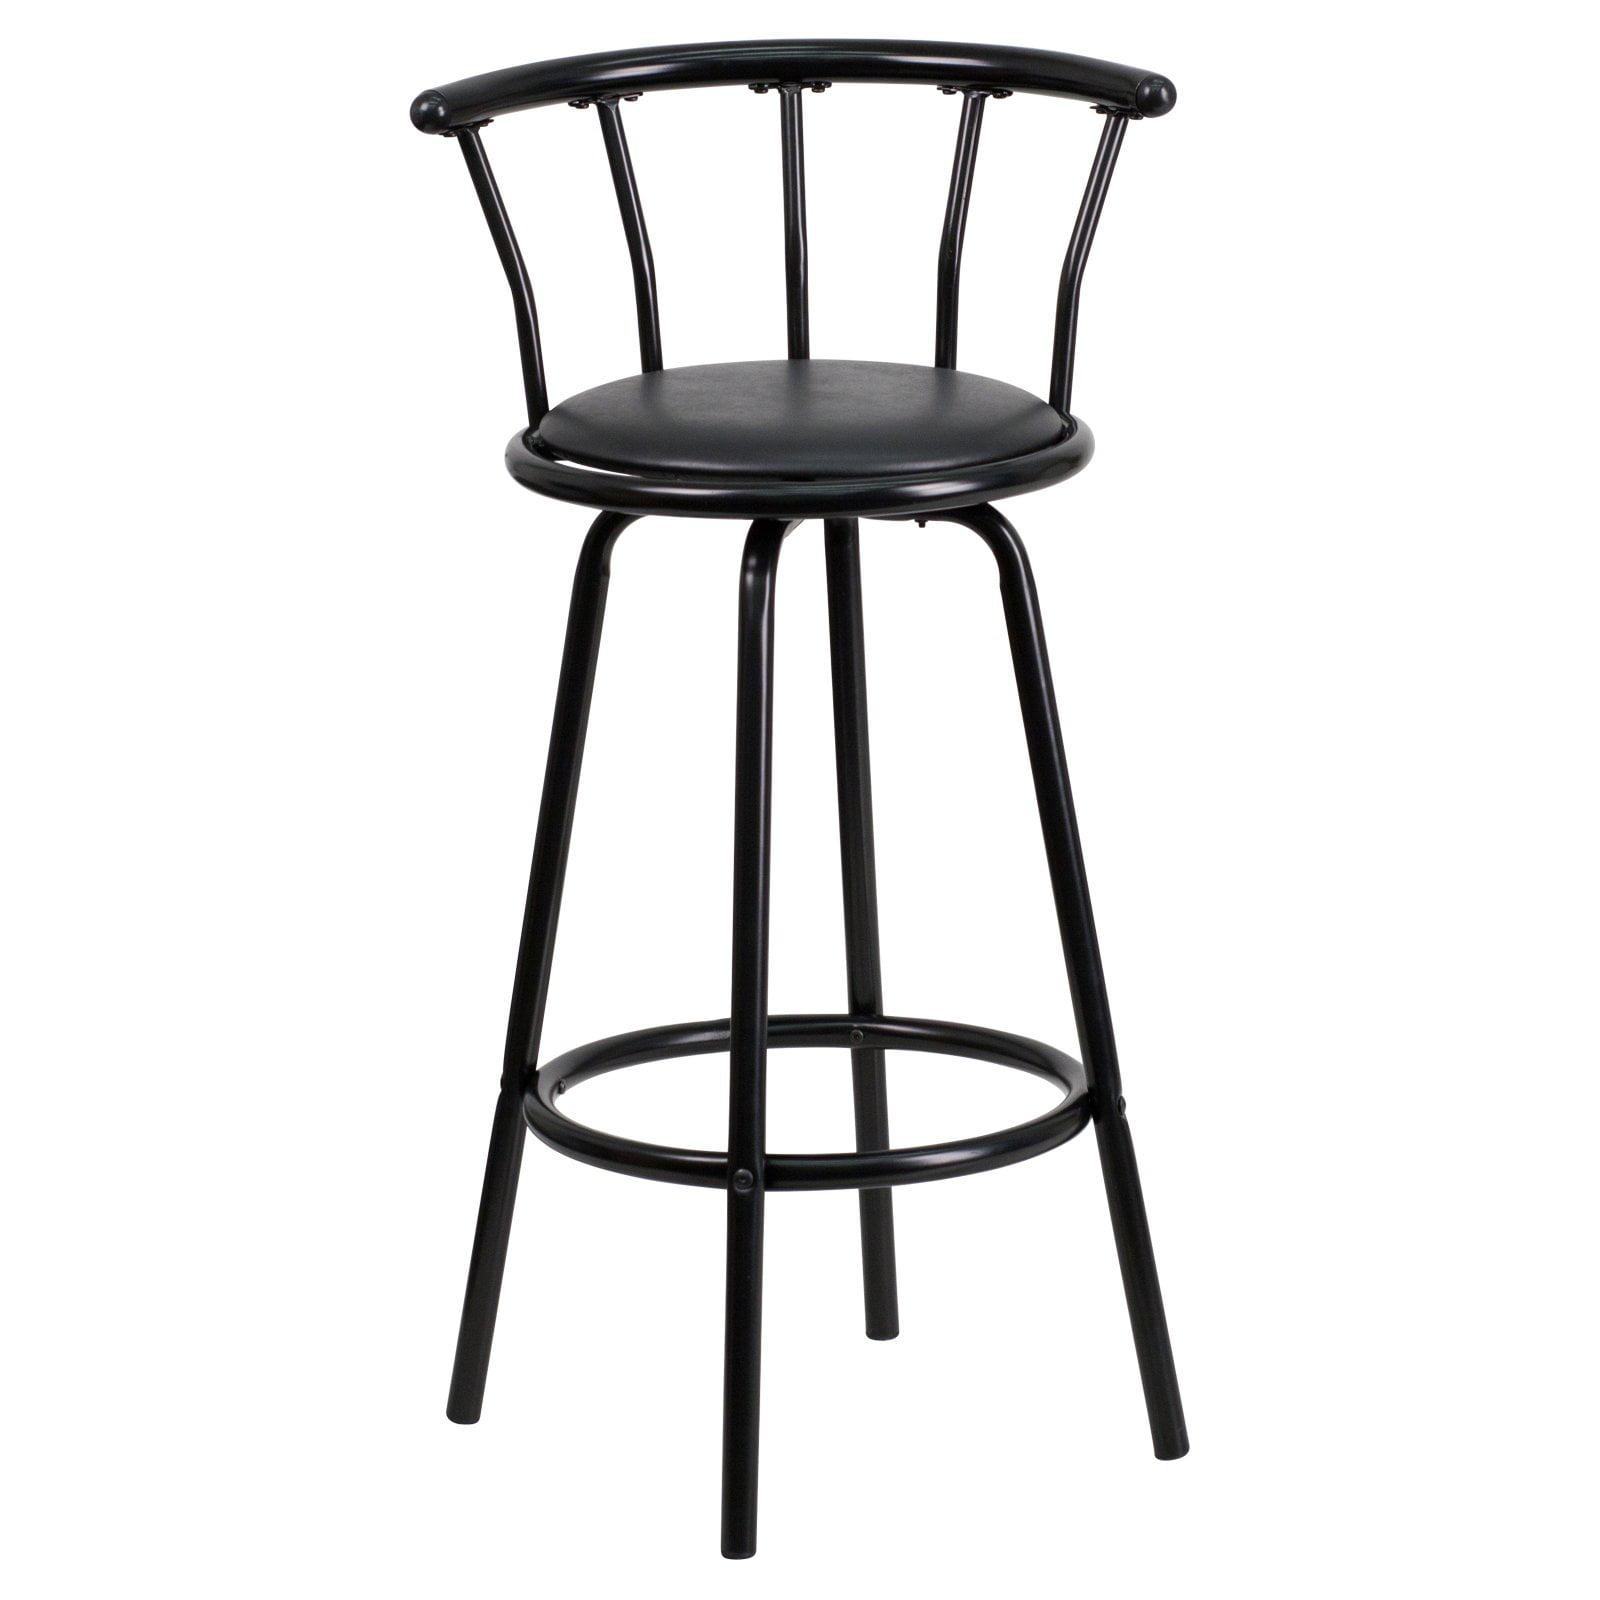 Set Of 4 Metal Black Swivel Vinyl Seat Pub Bar Stools: Bar Stool Indoor Swivel Seat Pub Bar Stools Chairs Black